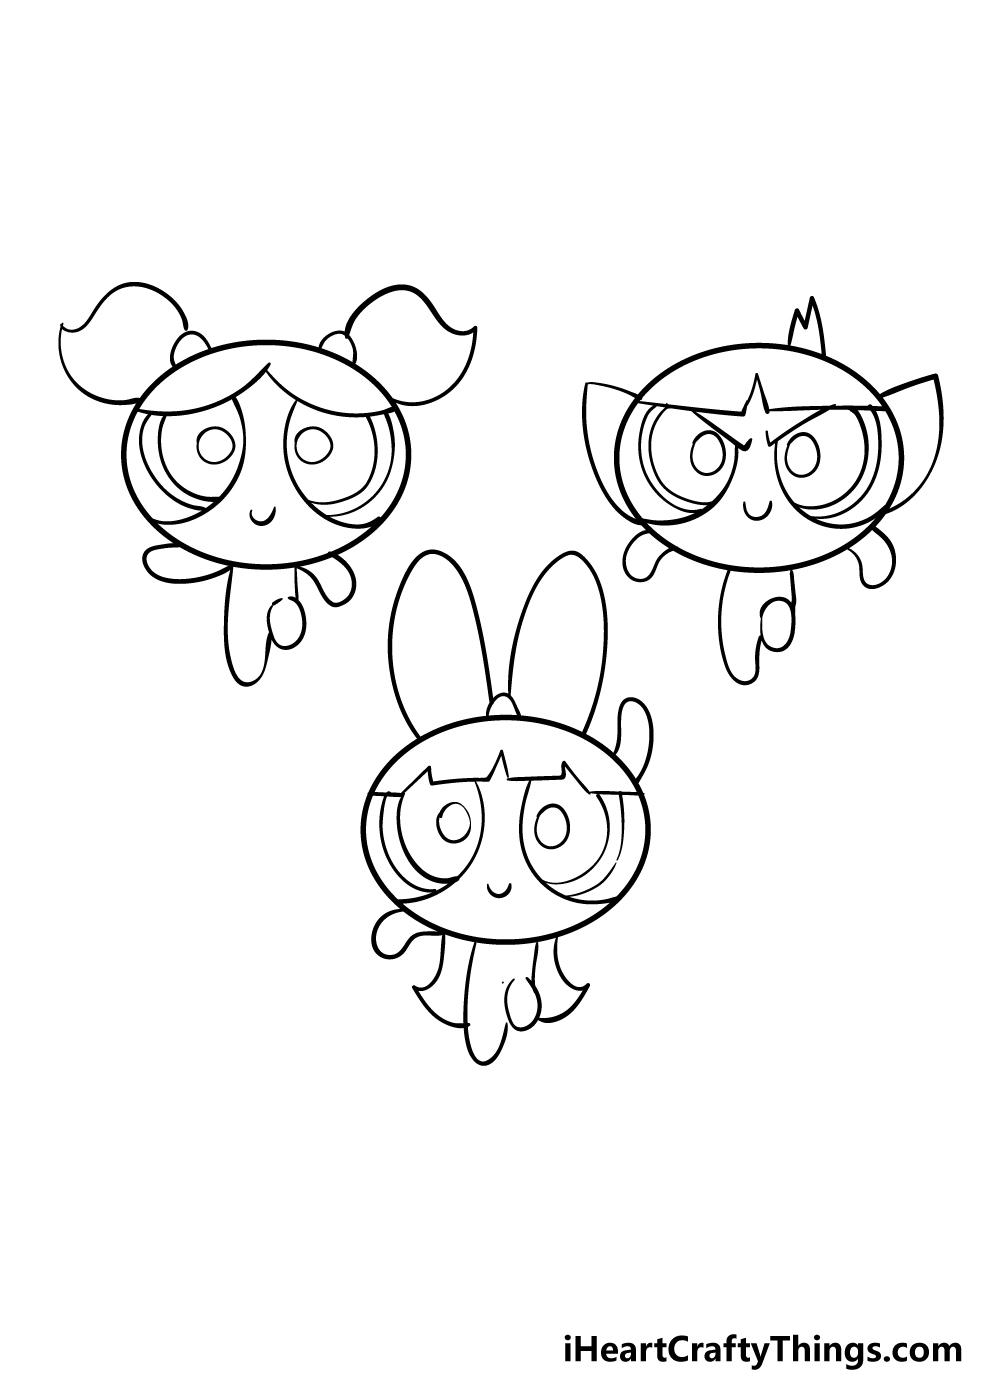 powerpuff girls drawing step 6